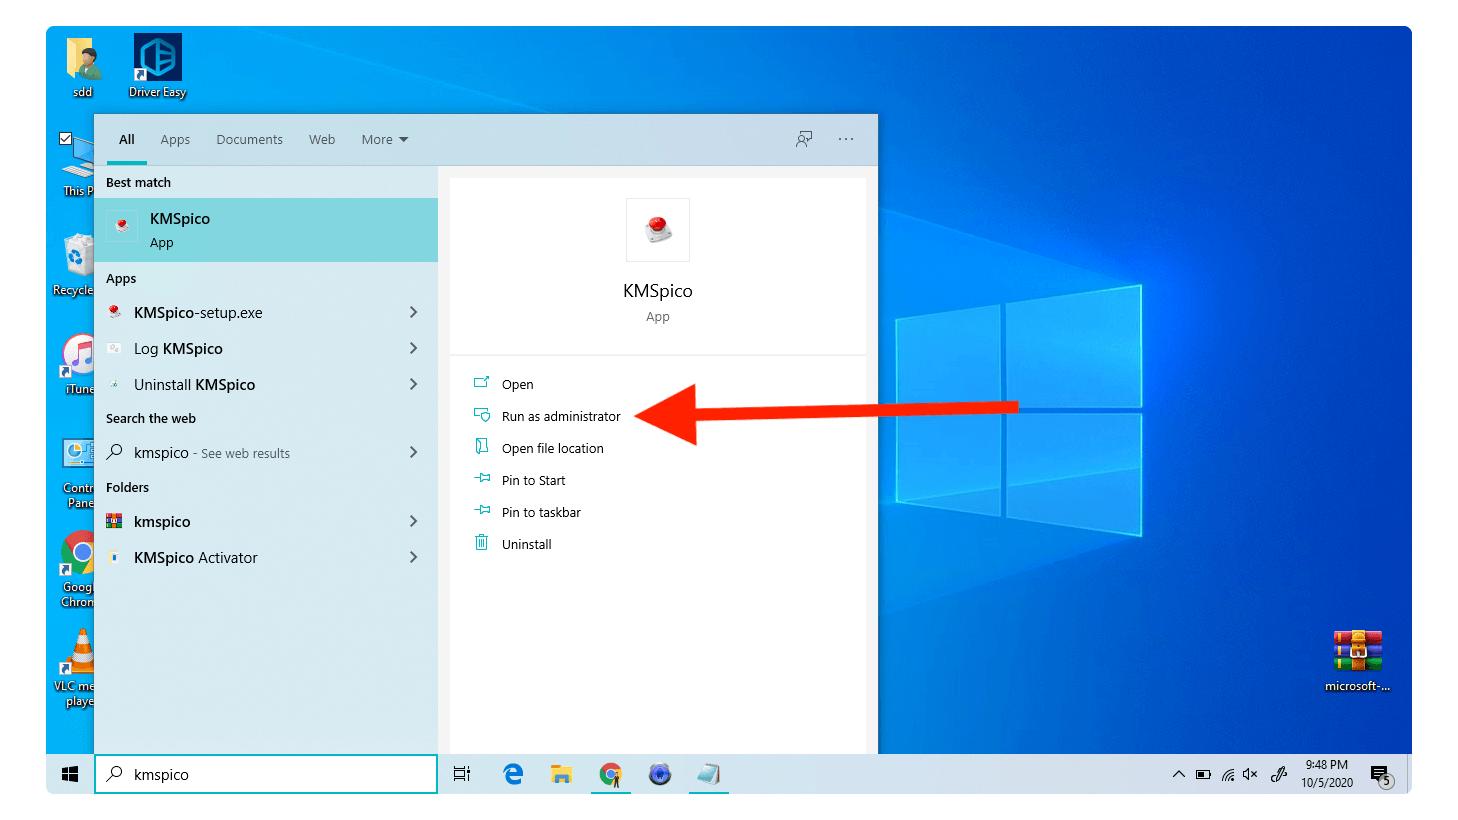 برنامج kmspico-windows-10-activator